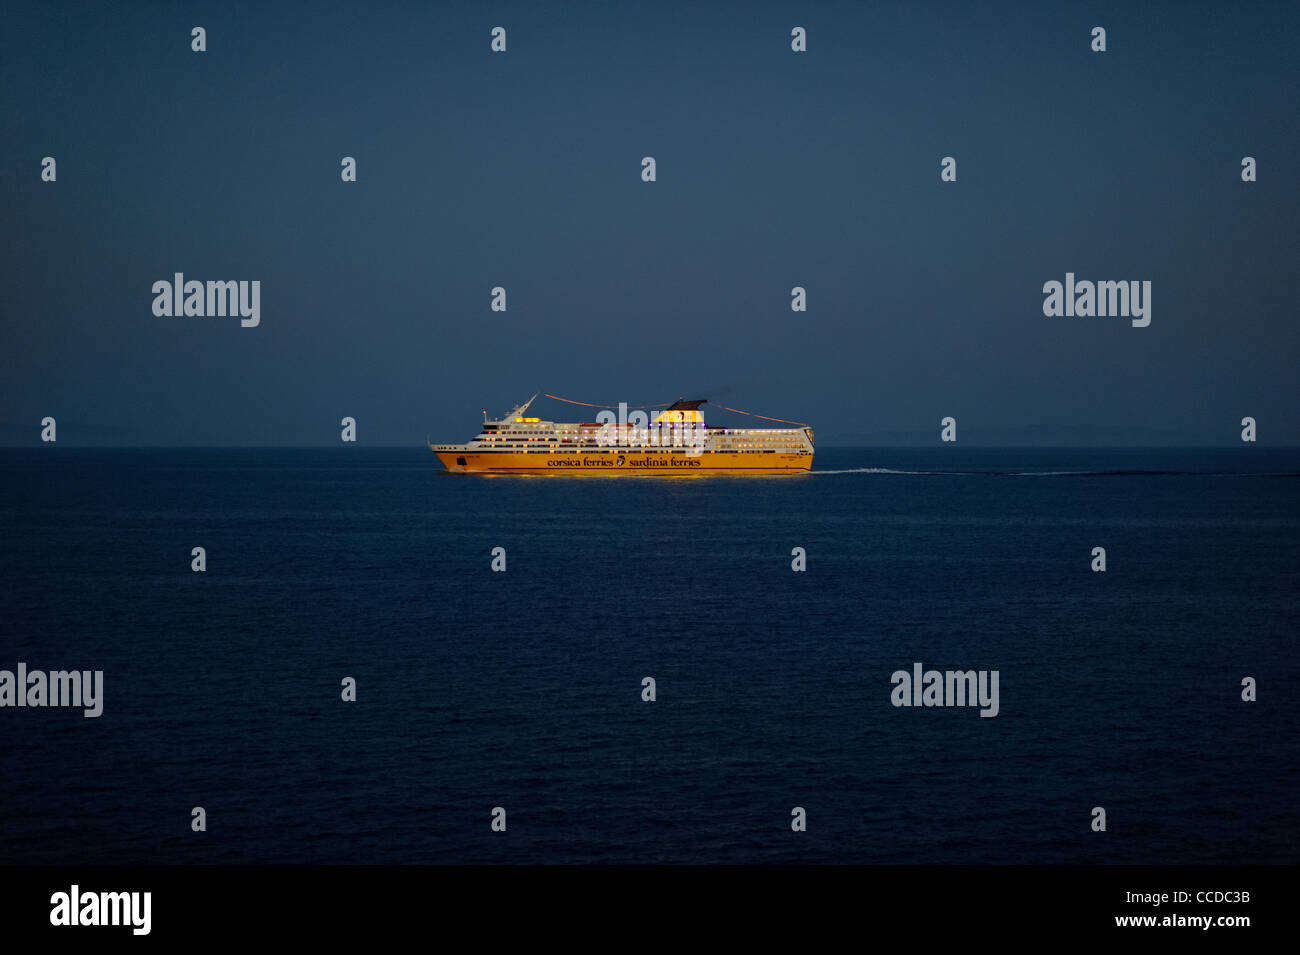 Sardinia Ferries ship, Olbia, Sardinia, Italy - Stock Image